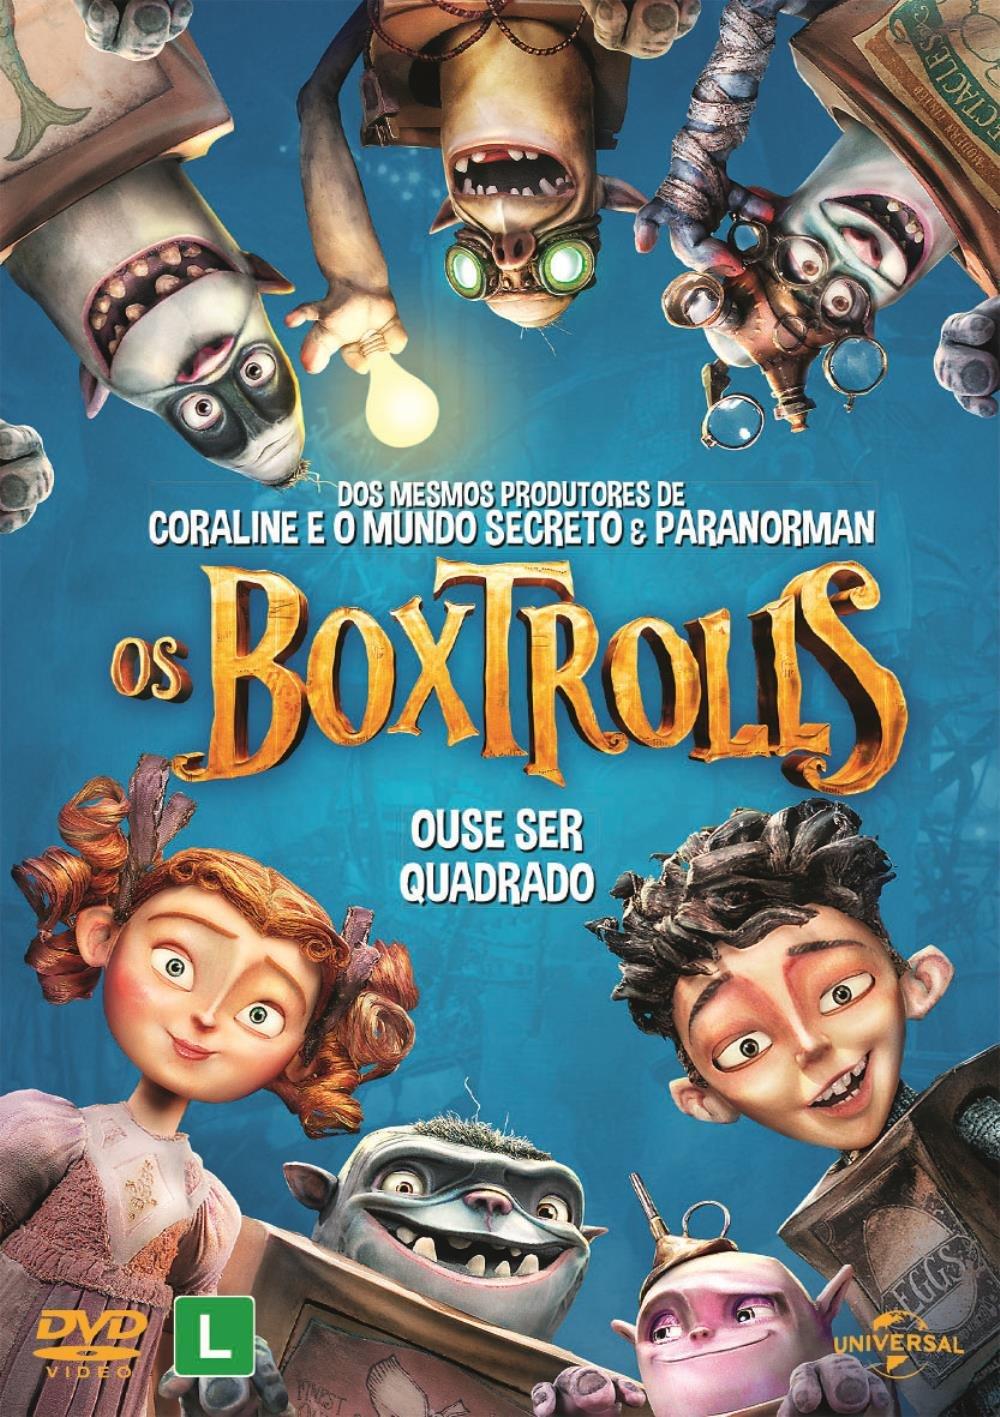 Os Boxtrolls - DVD - Saraiva